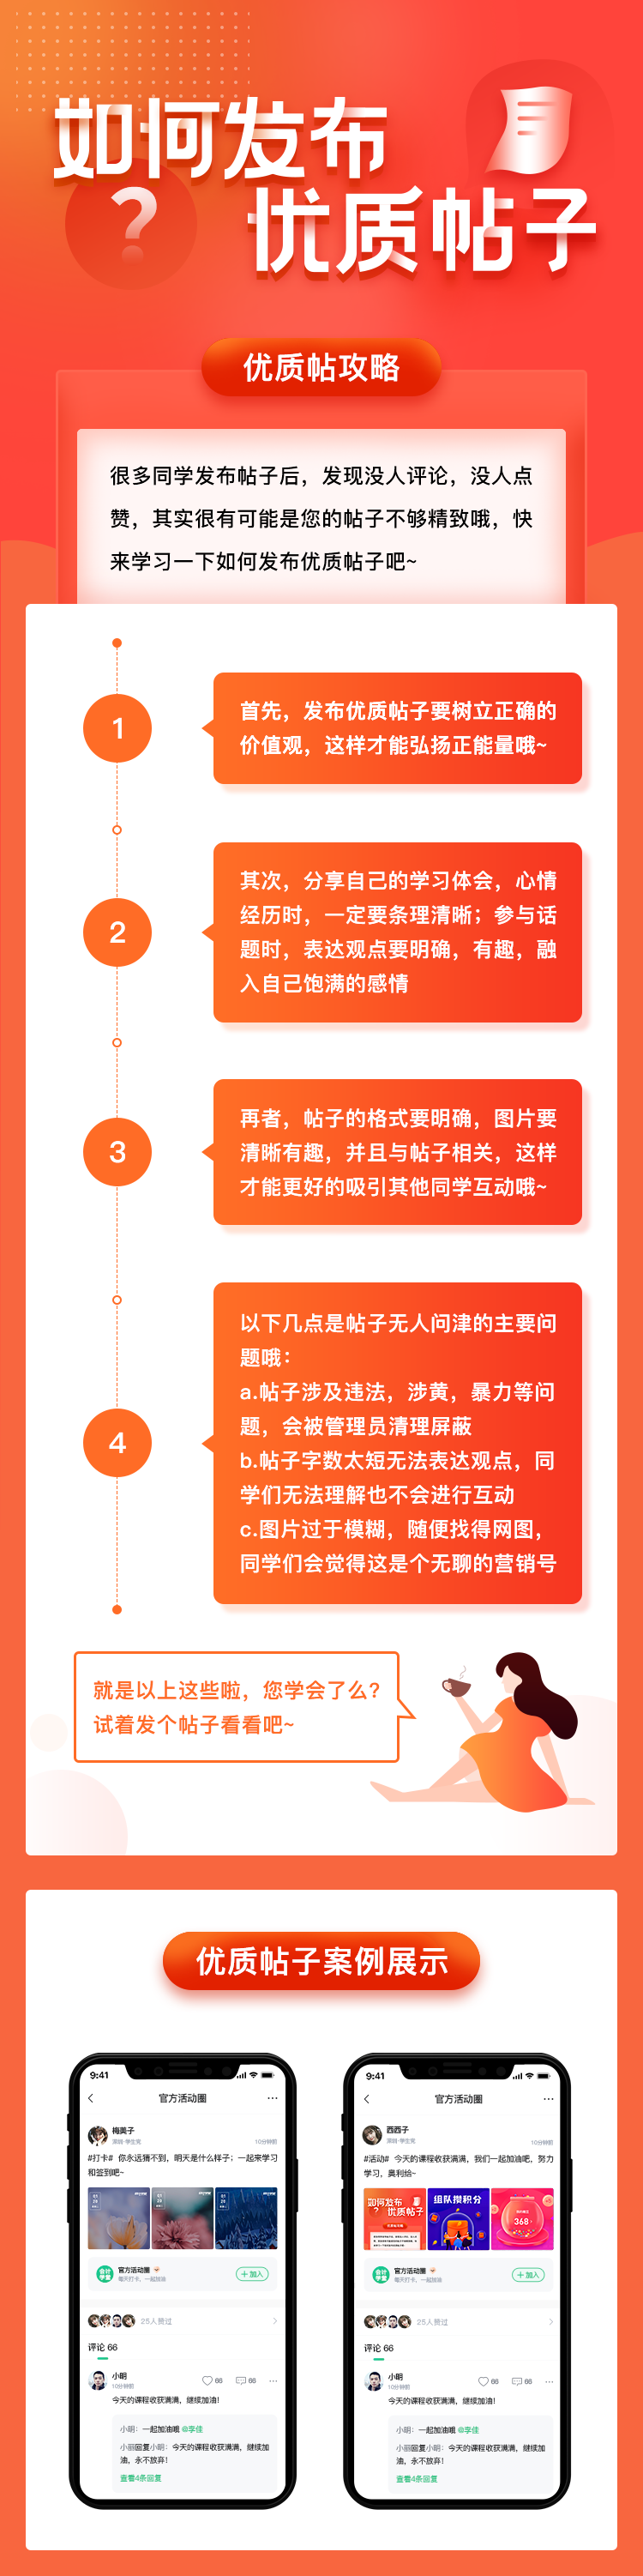 发布帖子海报(2).png